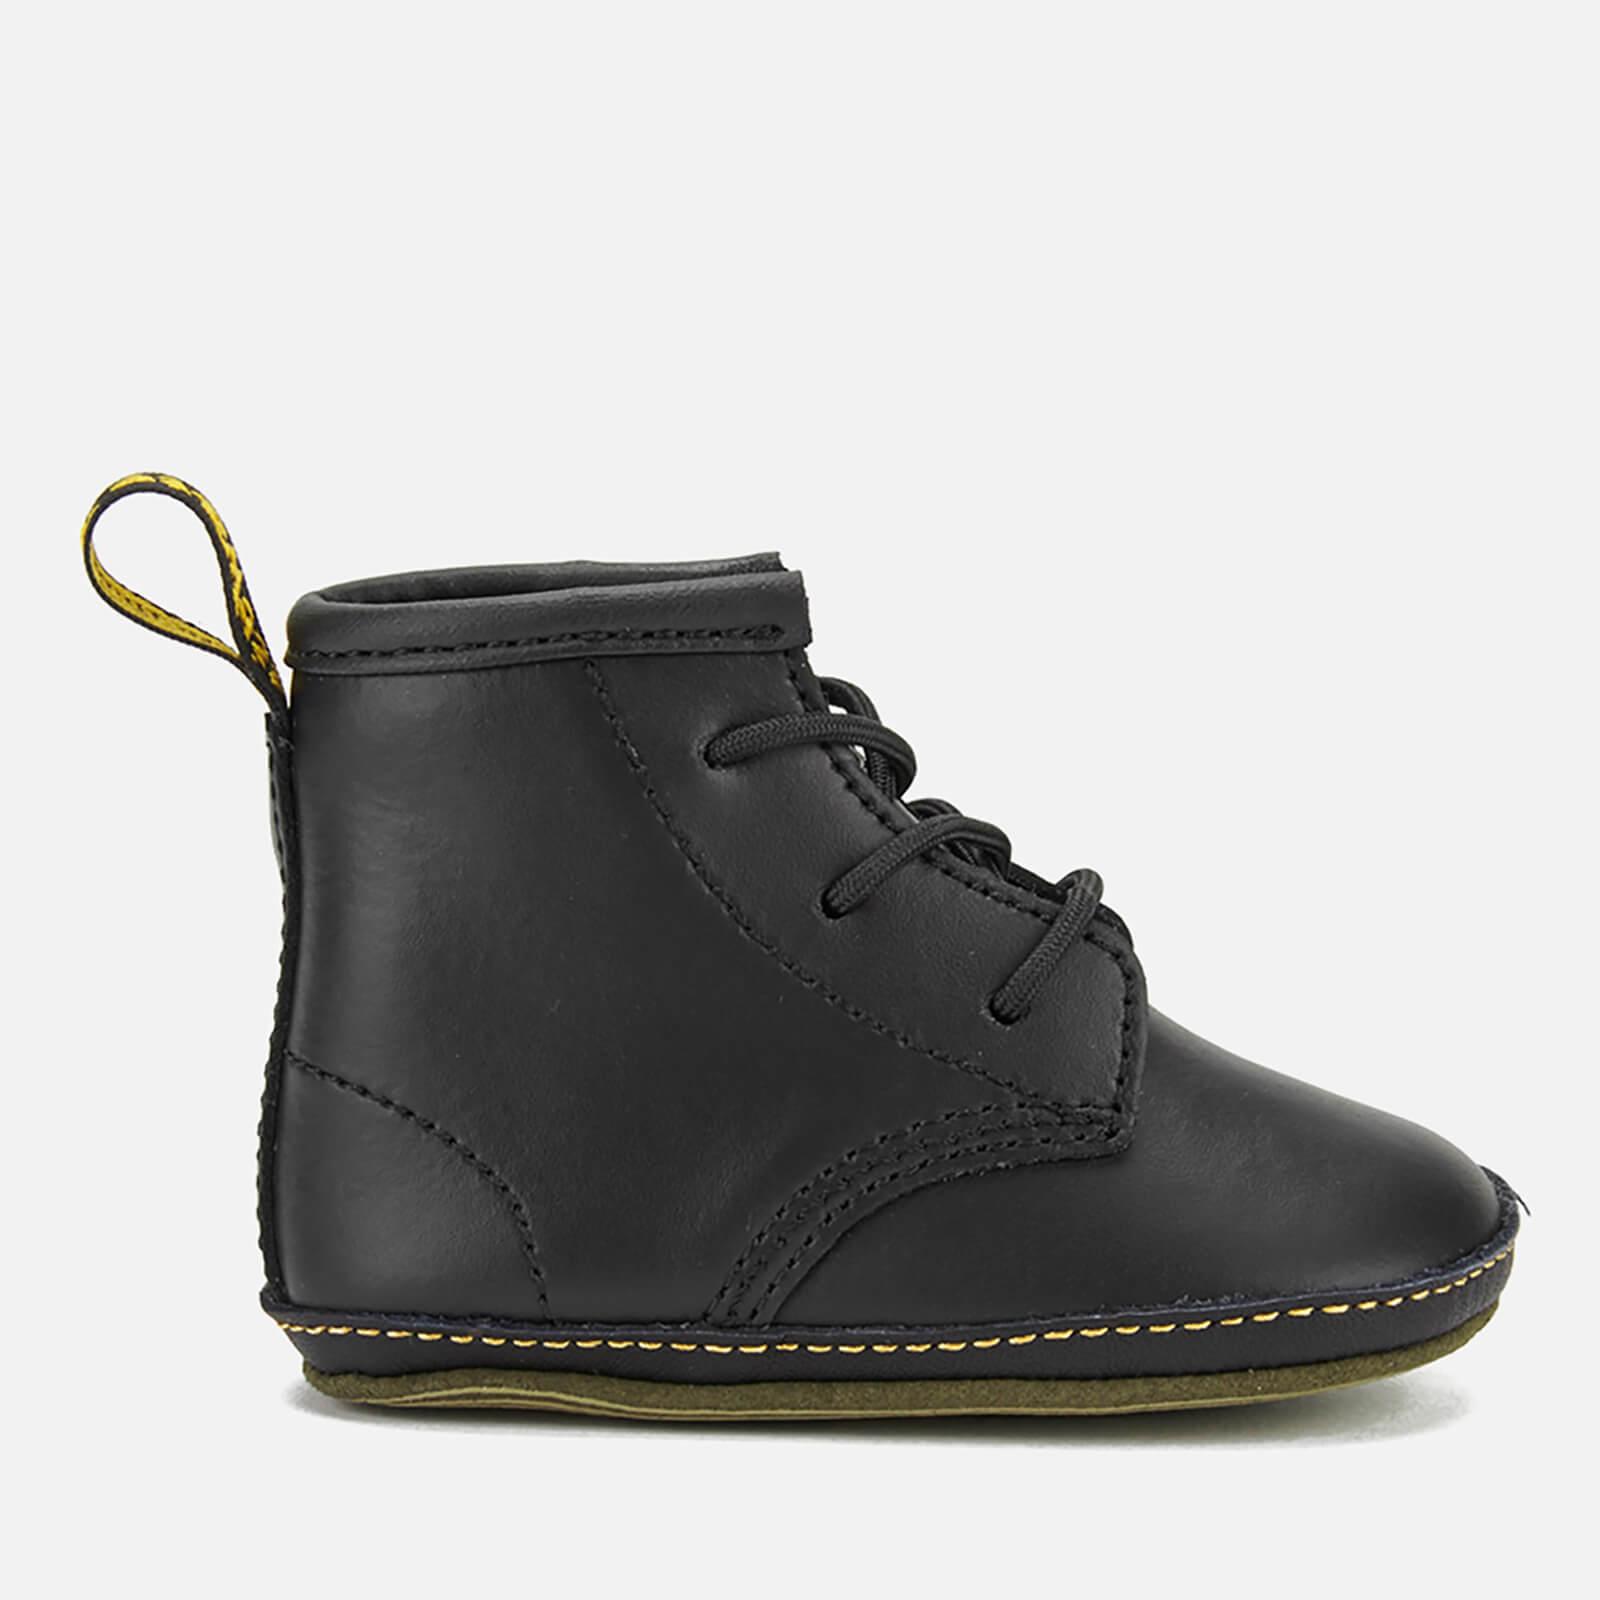 Dr. Martens Babies Auburn Kid Lamper Leather Boots - Black - UK 0 Baby - Black